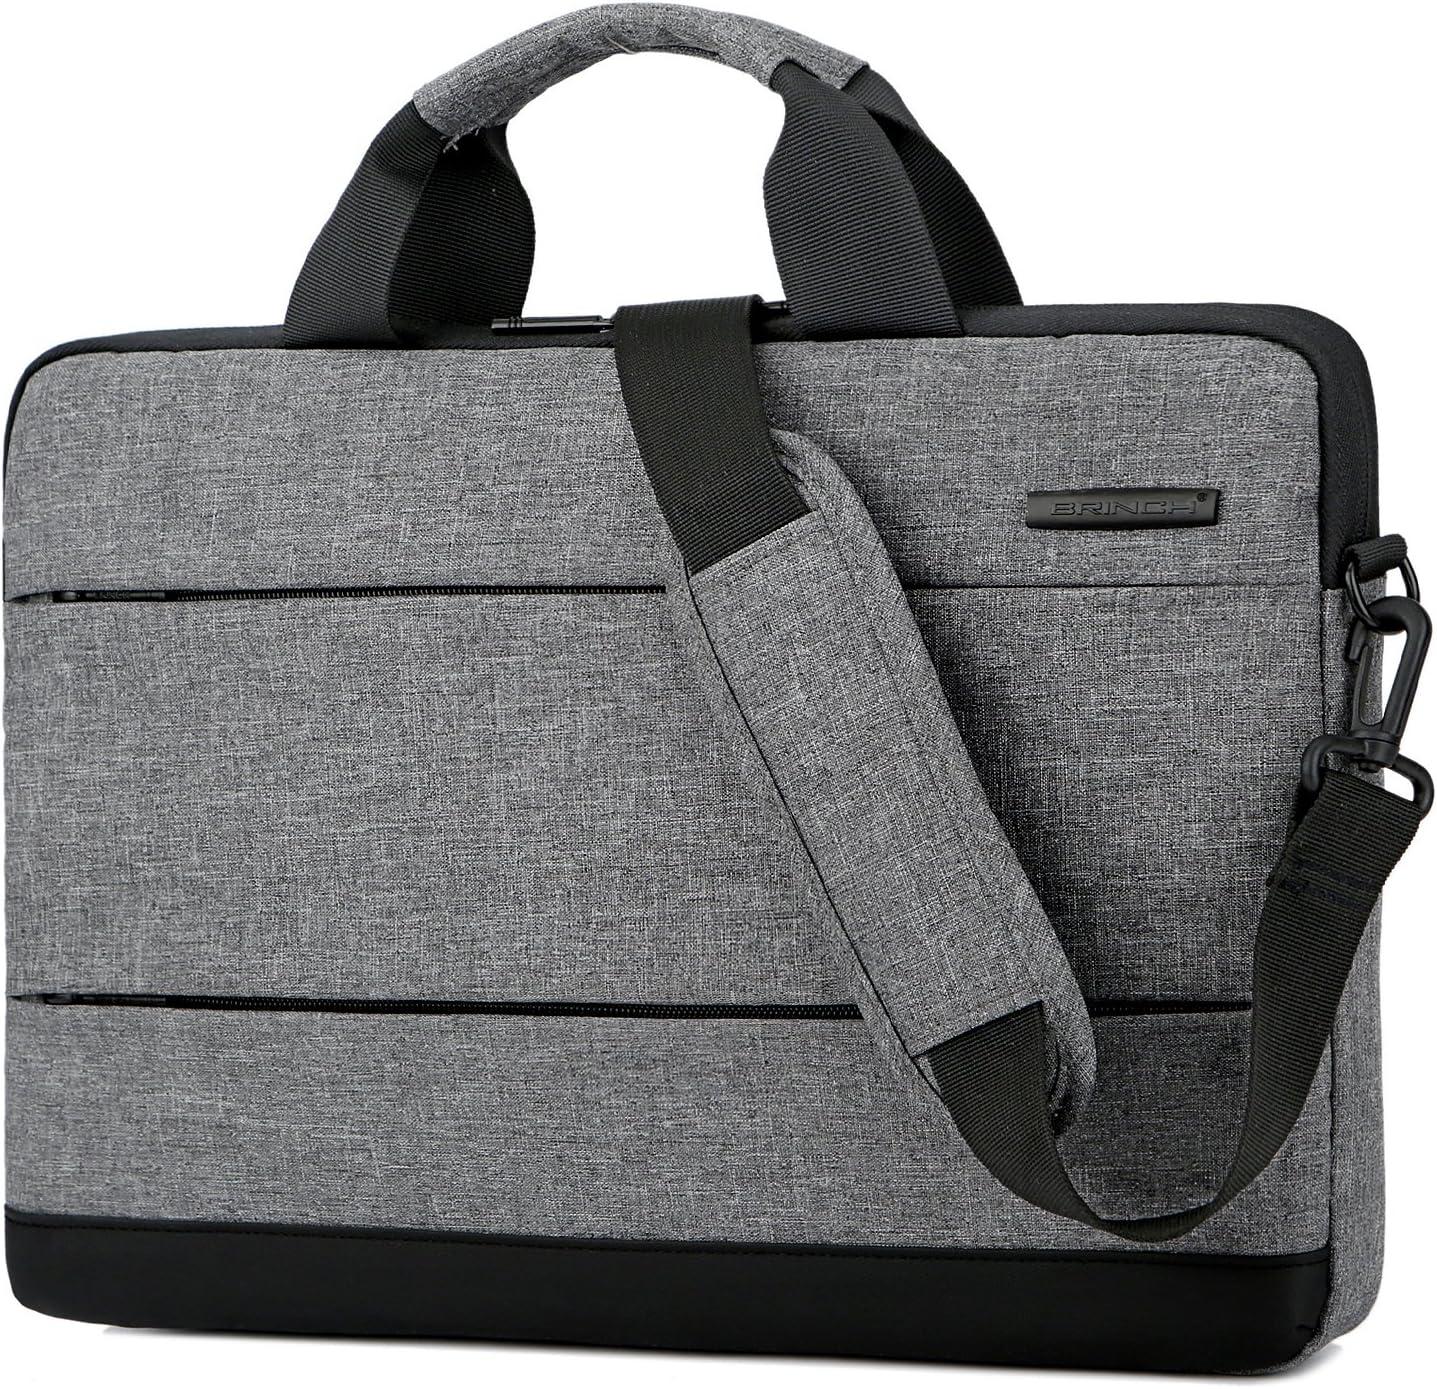 BRINCH Slim 15.6 Inch Laptop Bag,Classic Lightweight Portable Messenger Bag Sleeve Case Shoulder Bag for Work/Travel,Fits 15-15.6 Inches Laptop/Notebook/MacBook/Ultrabook Computer,Grey